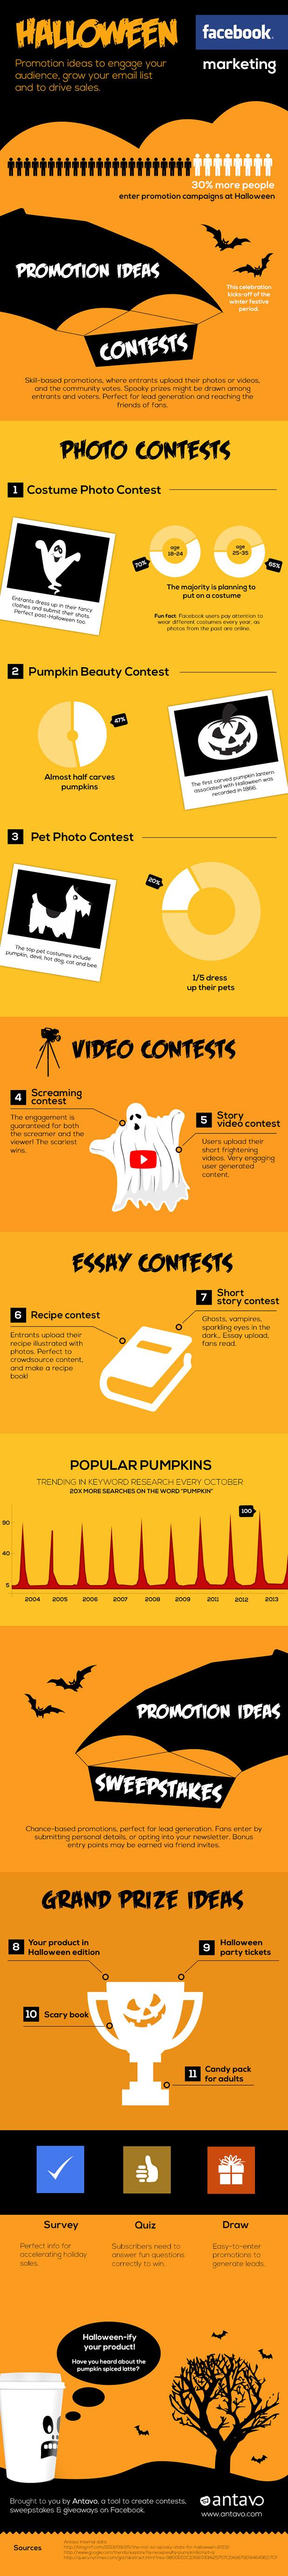 Marketing en FaceBook para Halloween